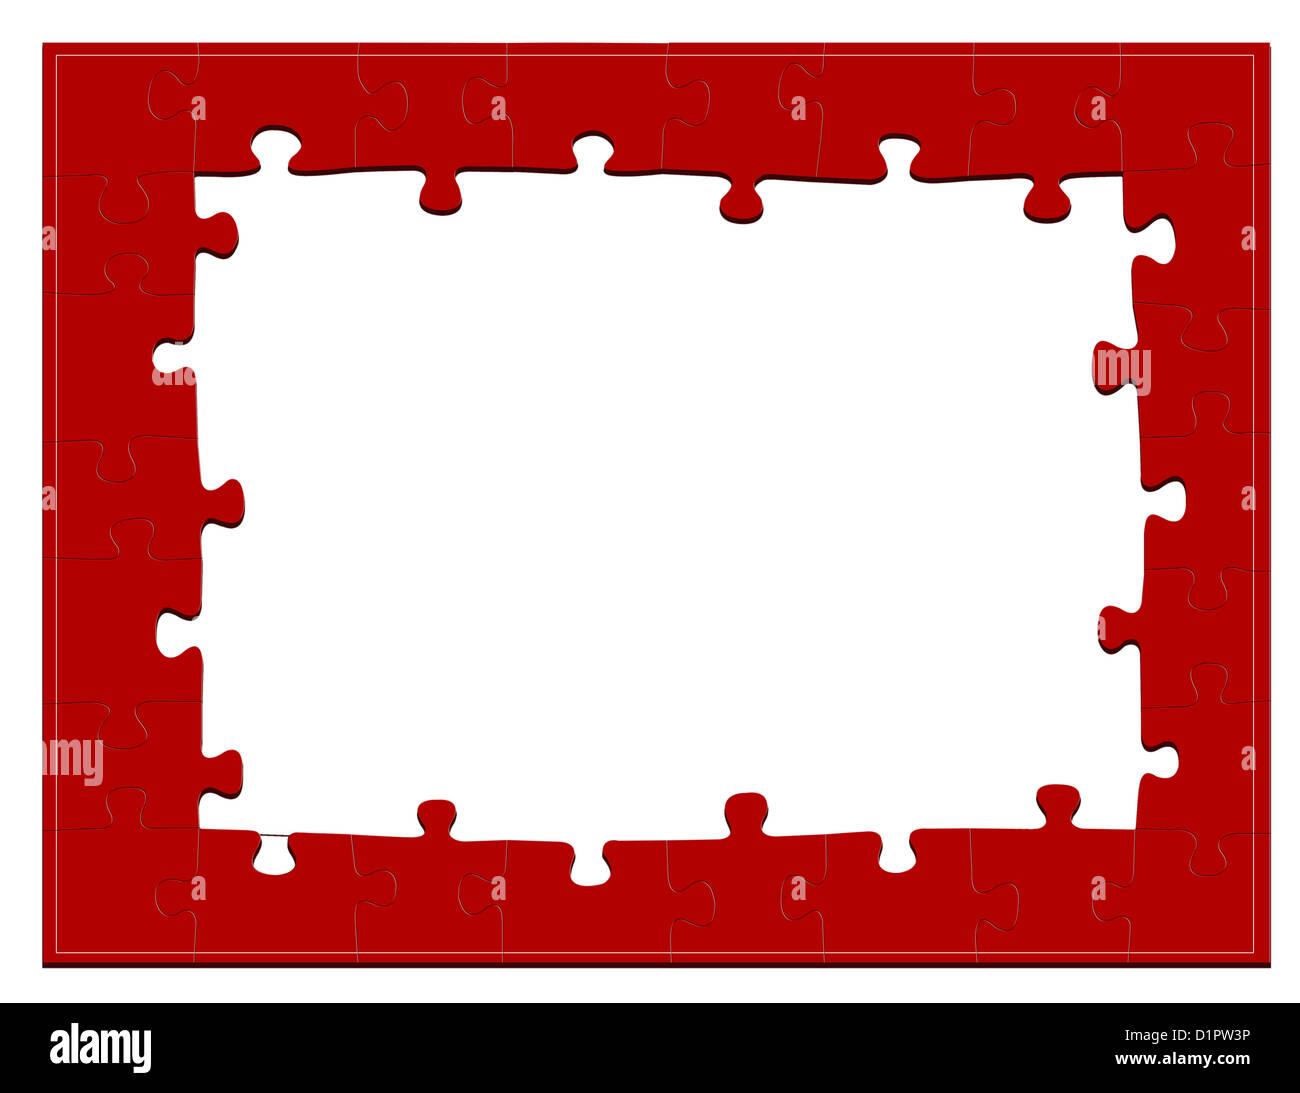 Jigsaw Puzzle Frame Imágenes De Stock & Jigsaw Puzzle Frame Fotos De ...